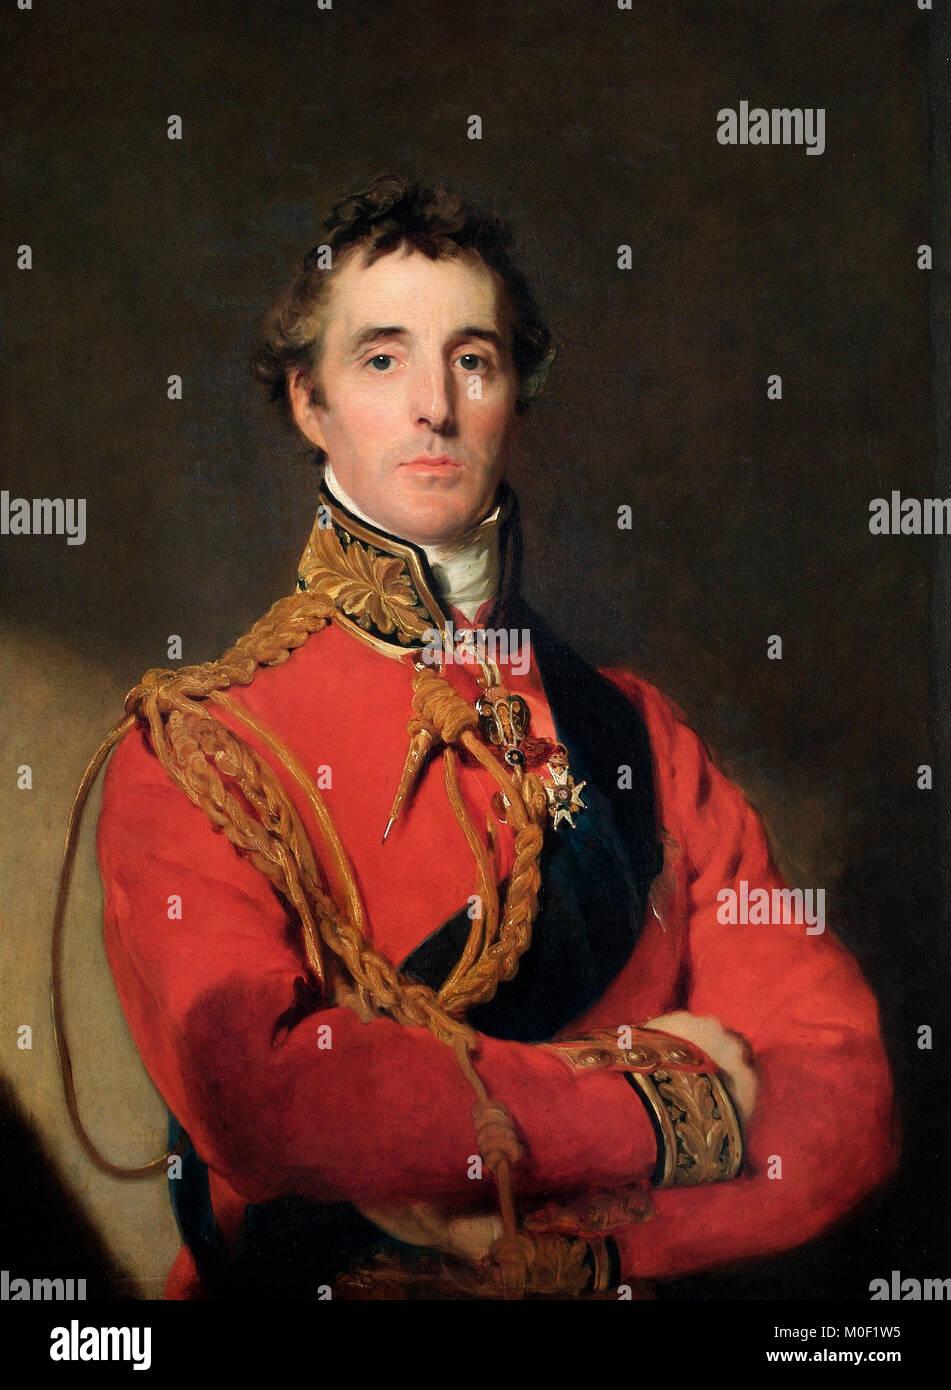 Arthur Wellesley, 1st Duke of Wellington (1769–1852) The Duke of Wellington is standing at half-length, wearing - Stock Image